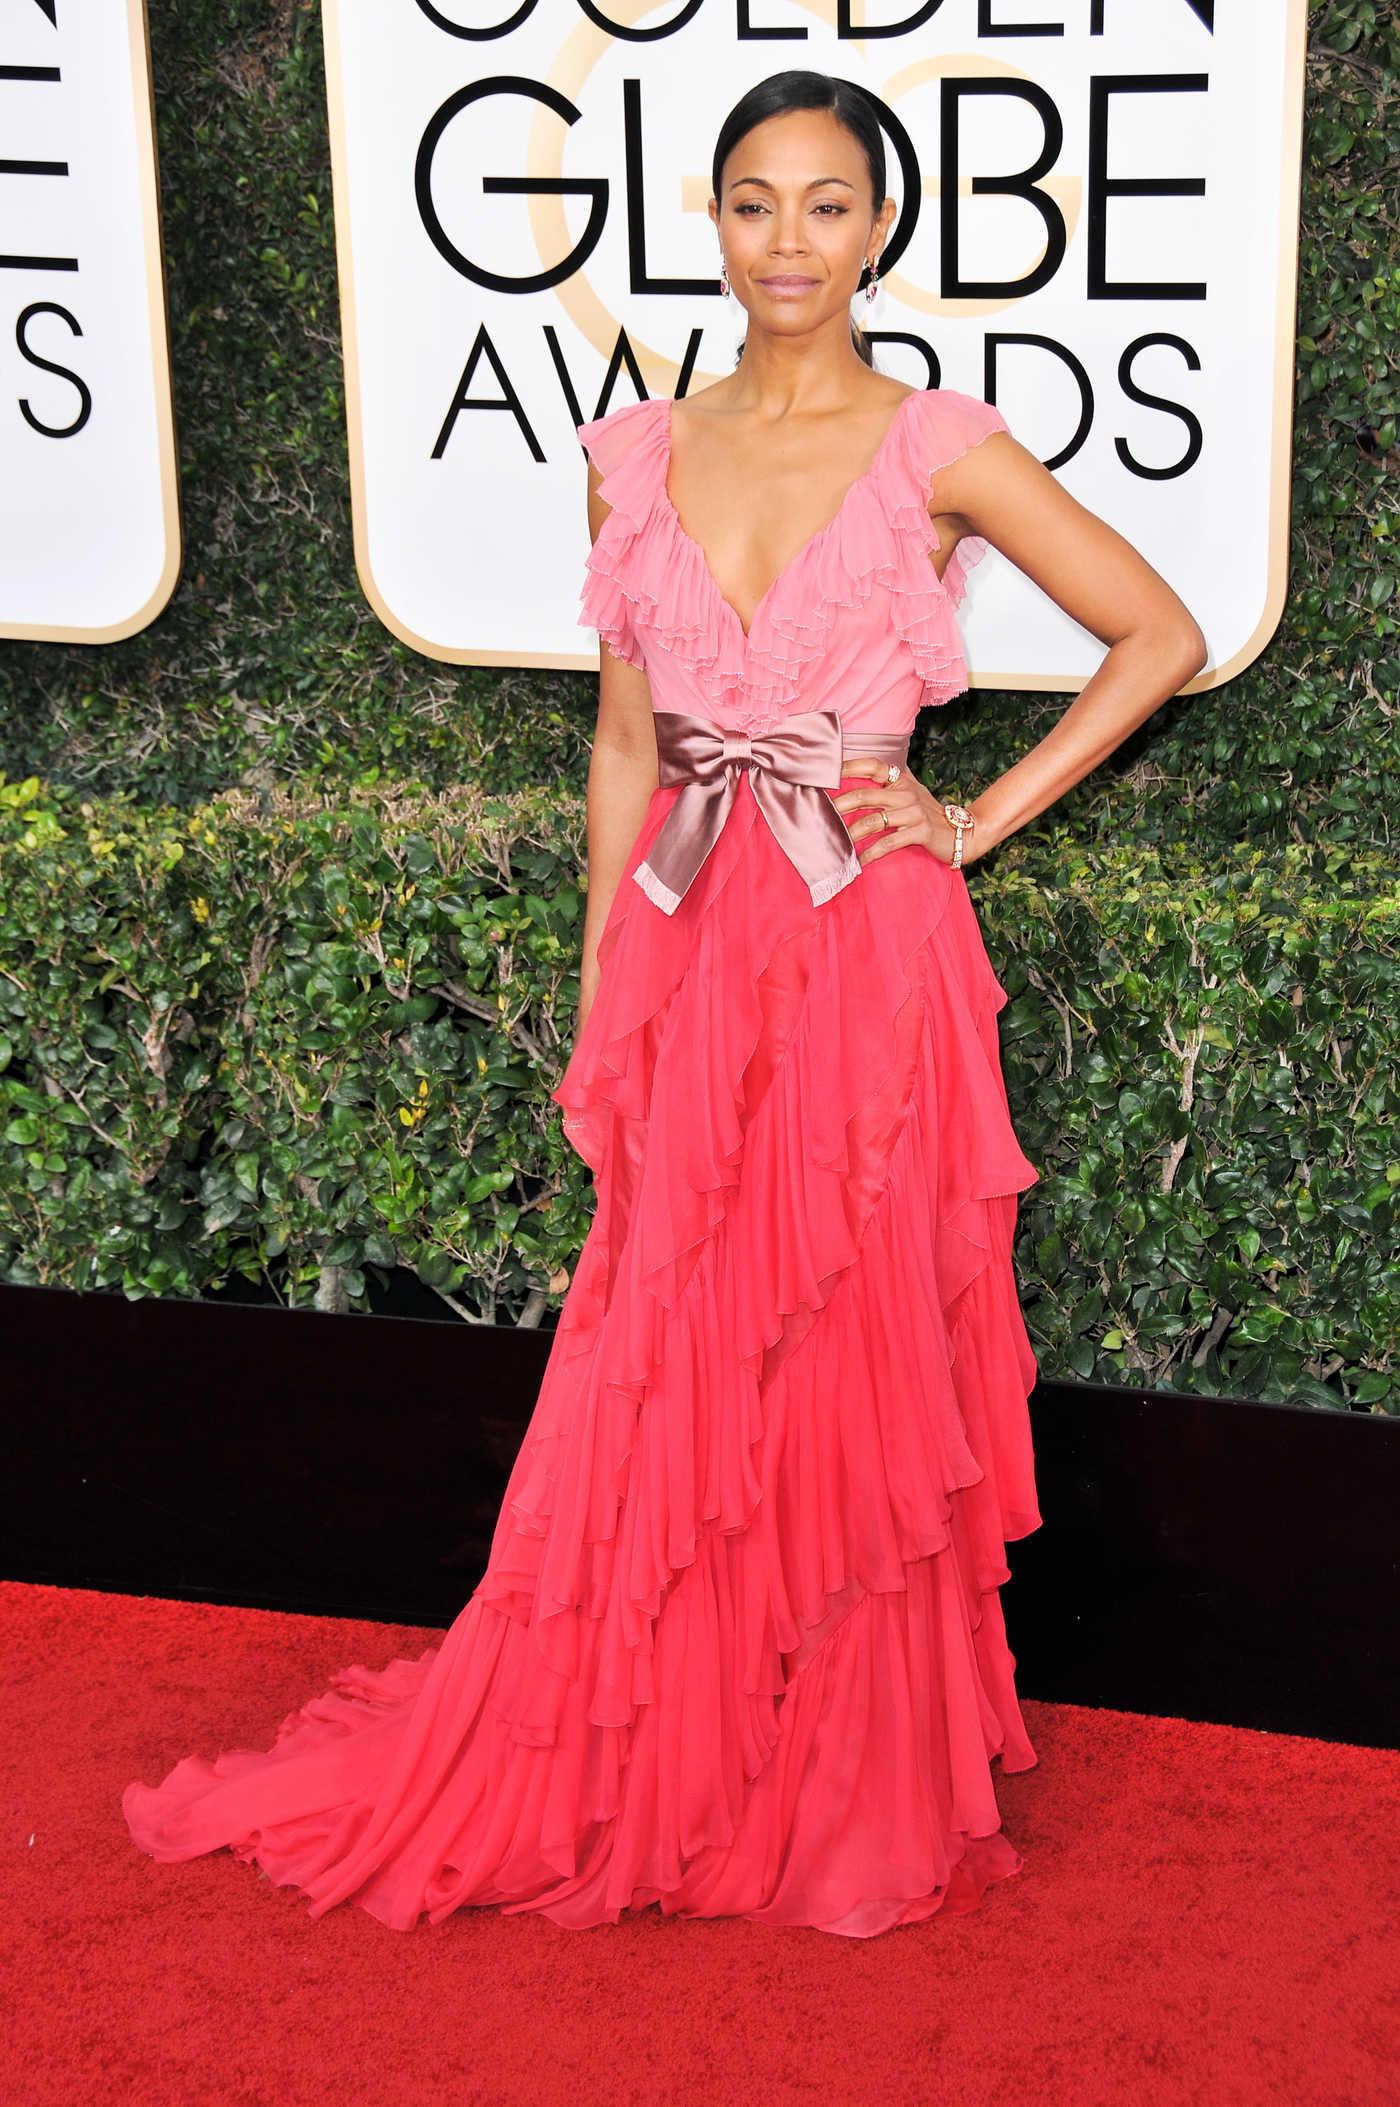 Zoe Saldana at the 74th Annual Golden Globe Awards in Beverly Hills 01/08/2017